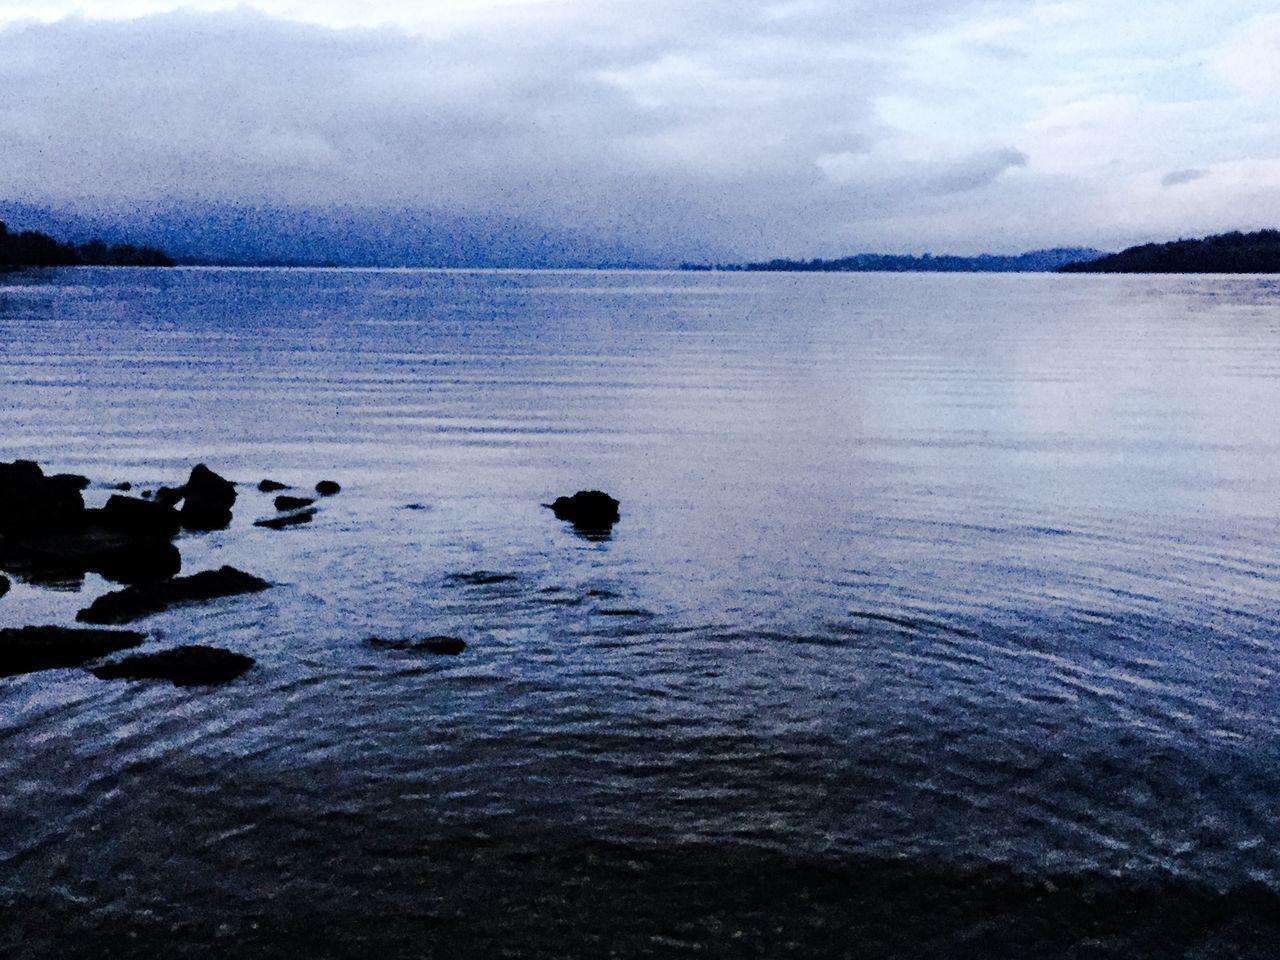 Today In Scotland Landscape Tranquil Scene Outdoors Water No People Ripples Mountain Range Beauty In Nature Reflection Idyllic Calm Blue Sky Rock - Object Rocks Tranquility LochLomond